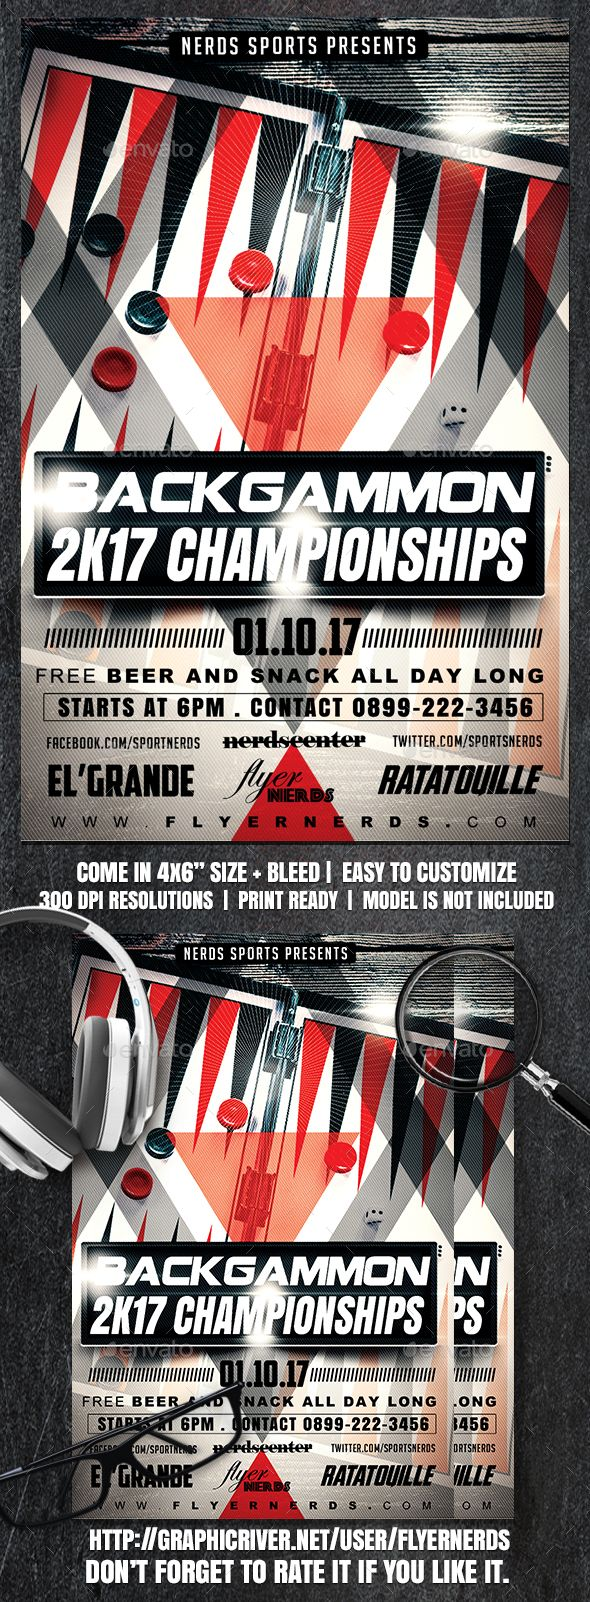 Backgammon 2K17 Championships Sports Flyer by flyernerds